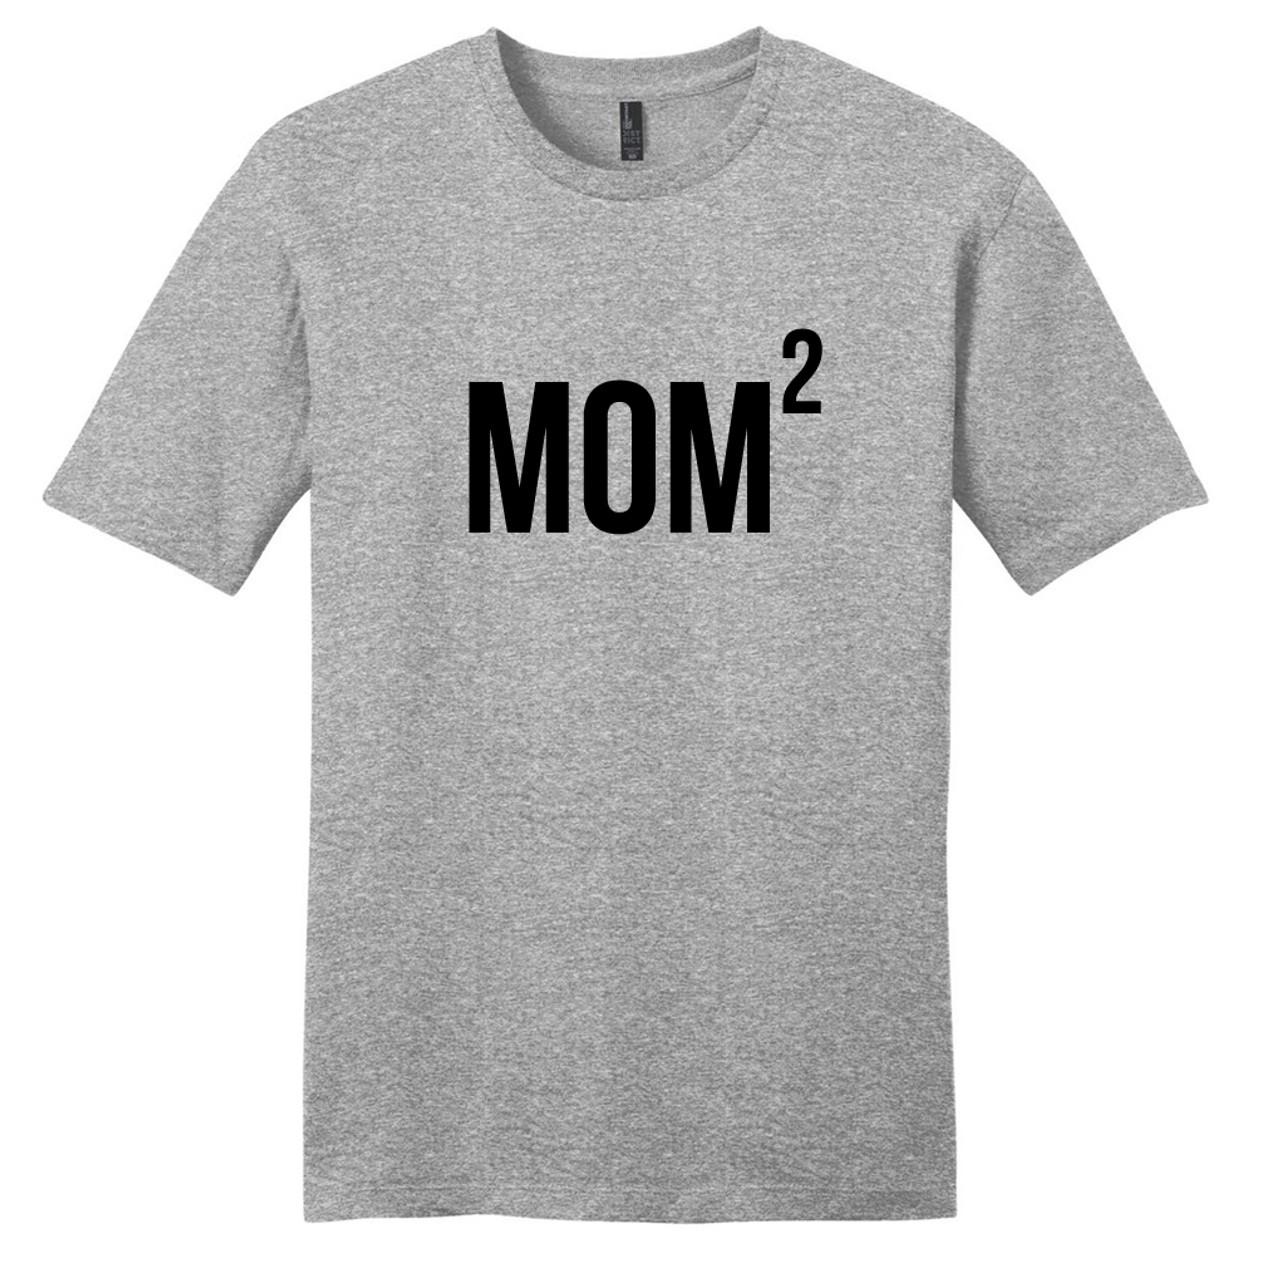 4a243434e Light Heathered Gray Custom Mom x 2 T-Shirt | Sweetums Shirt